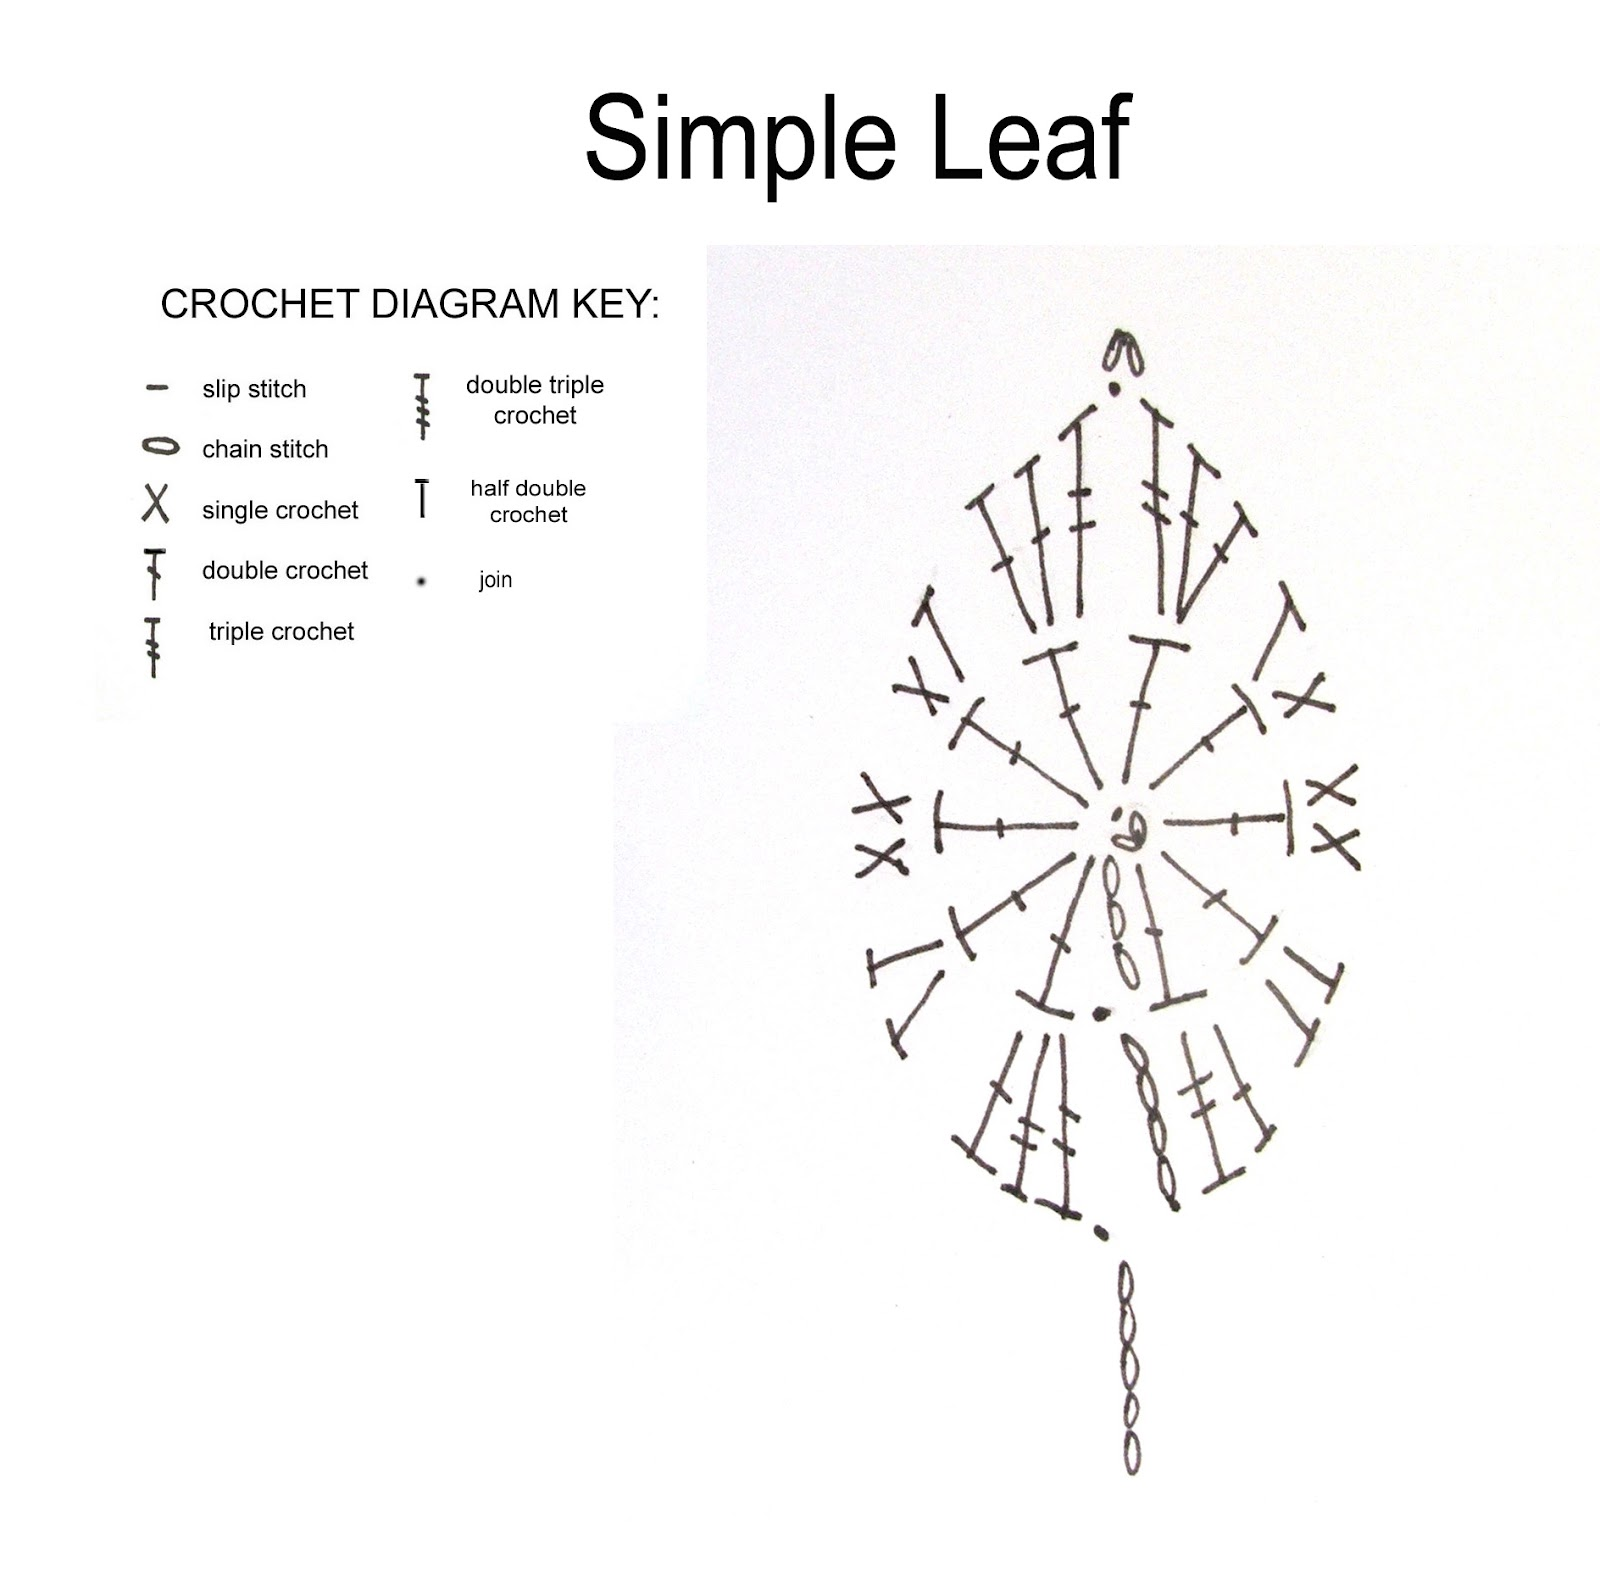 diagram crochet pattern hampton bay well light susan 39s hippie free simple leaf